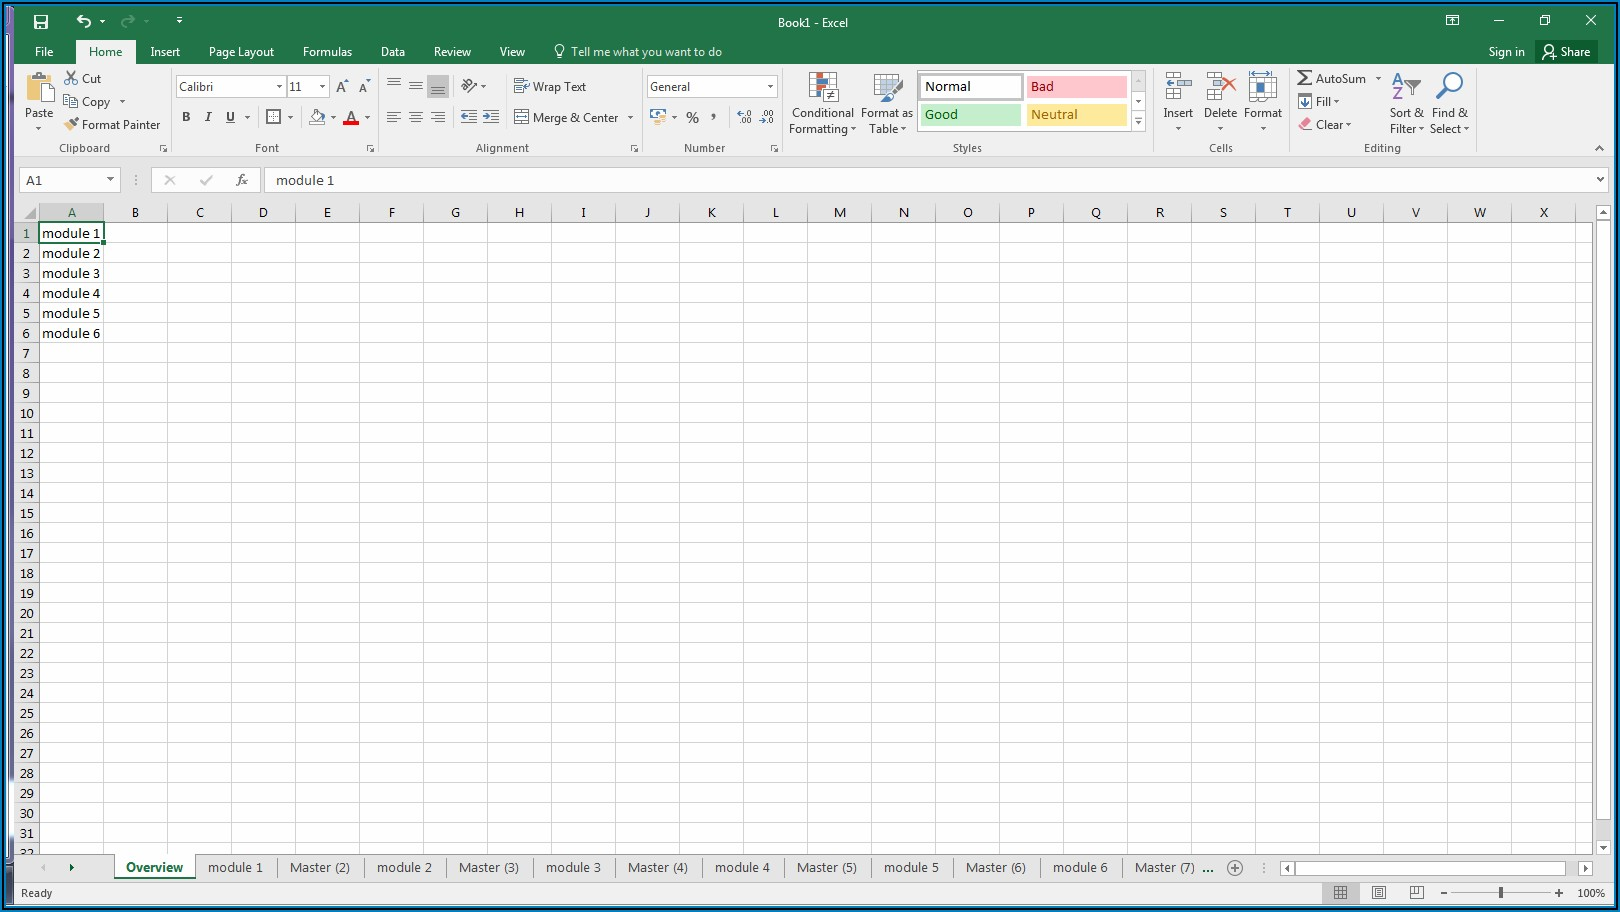 Excel Vba Copy Sheet And Rename